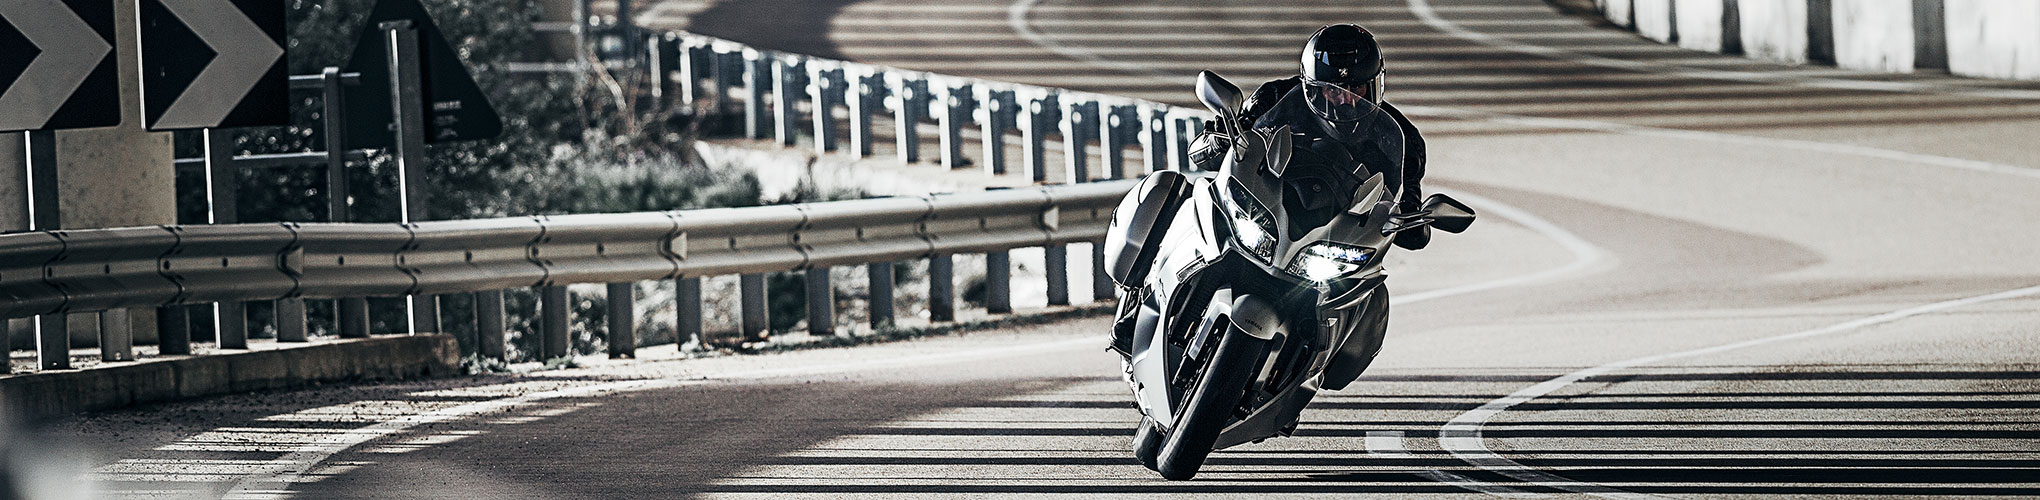 Yamaha FJR1300AE/AS Explorer | MotorCentrumWest